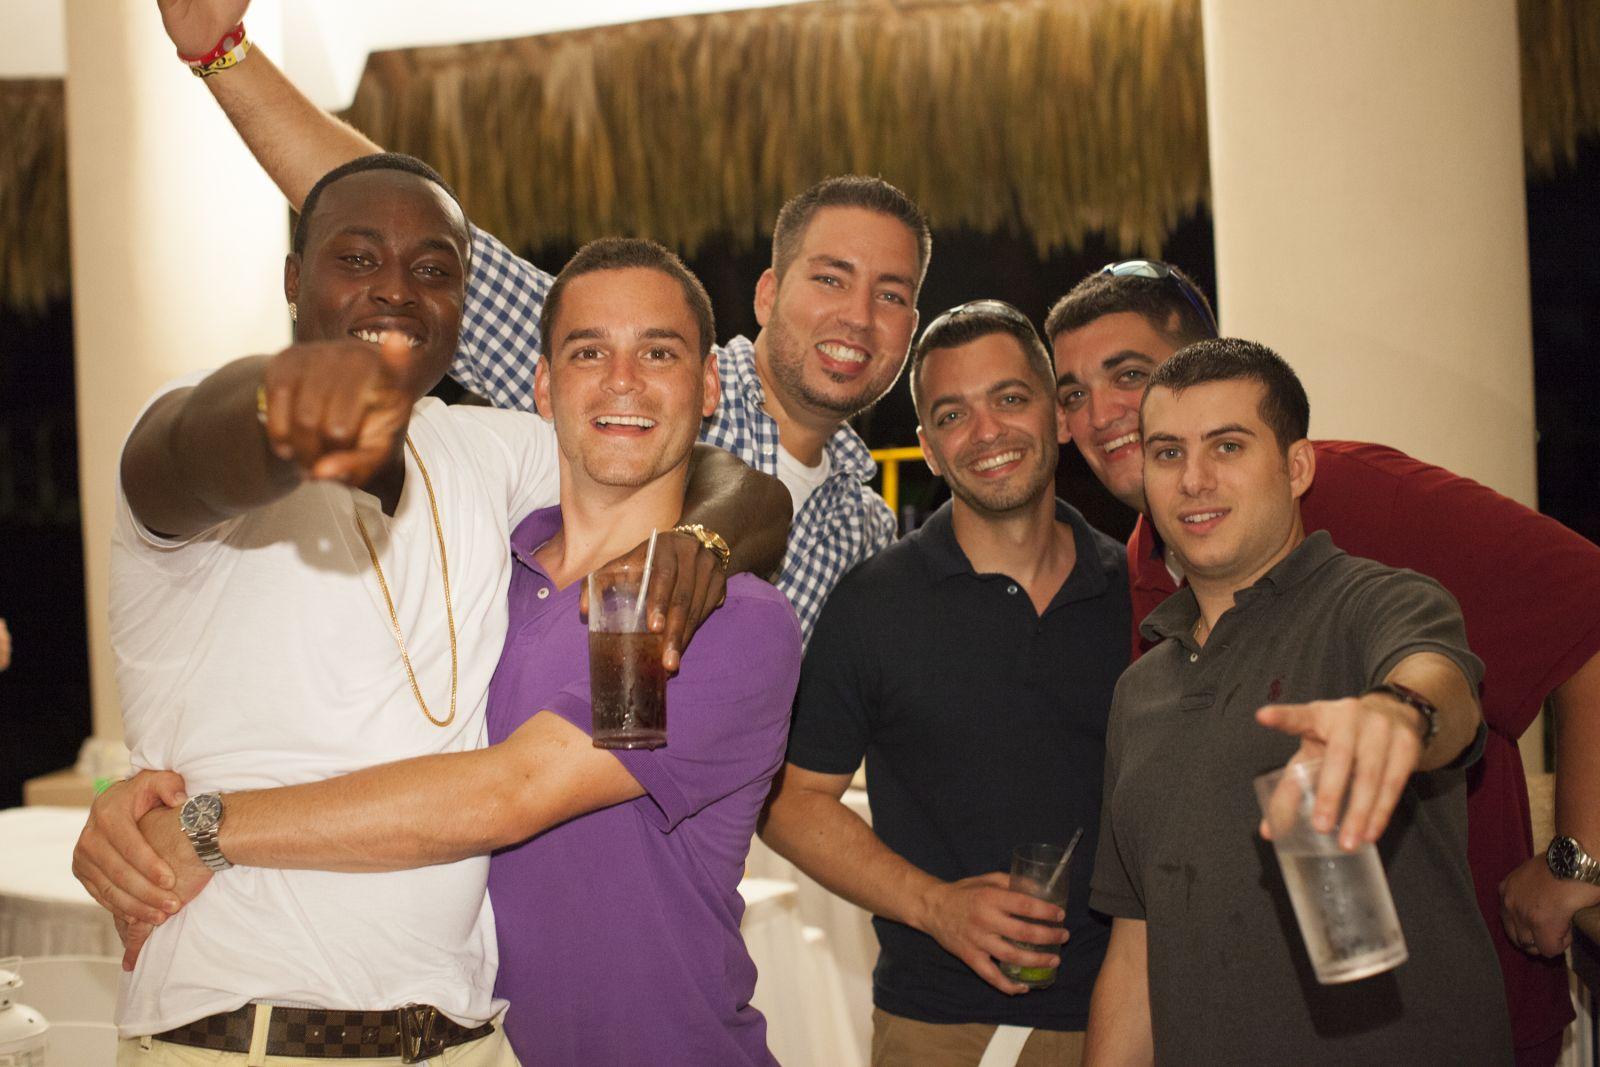 The Hard Rock Punta Cana